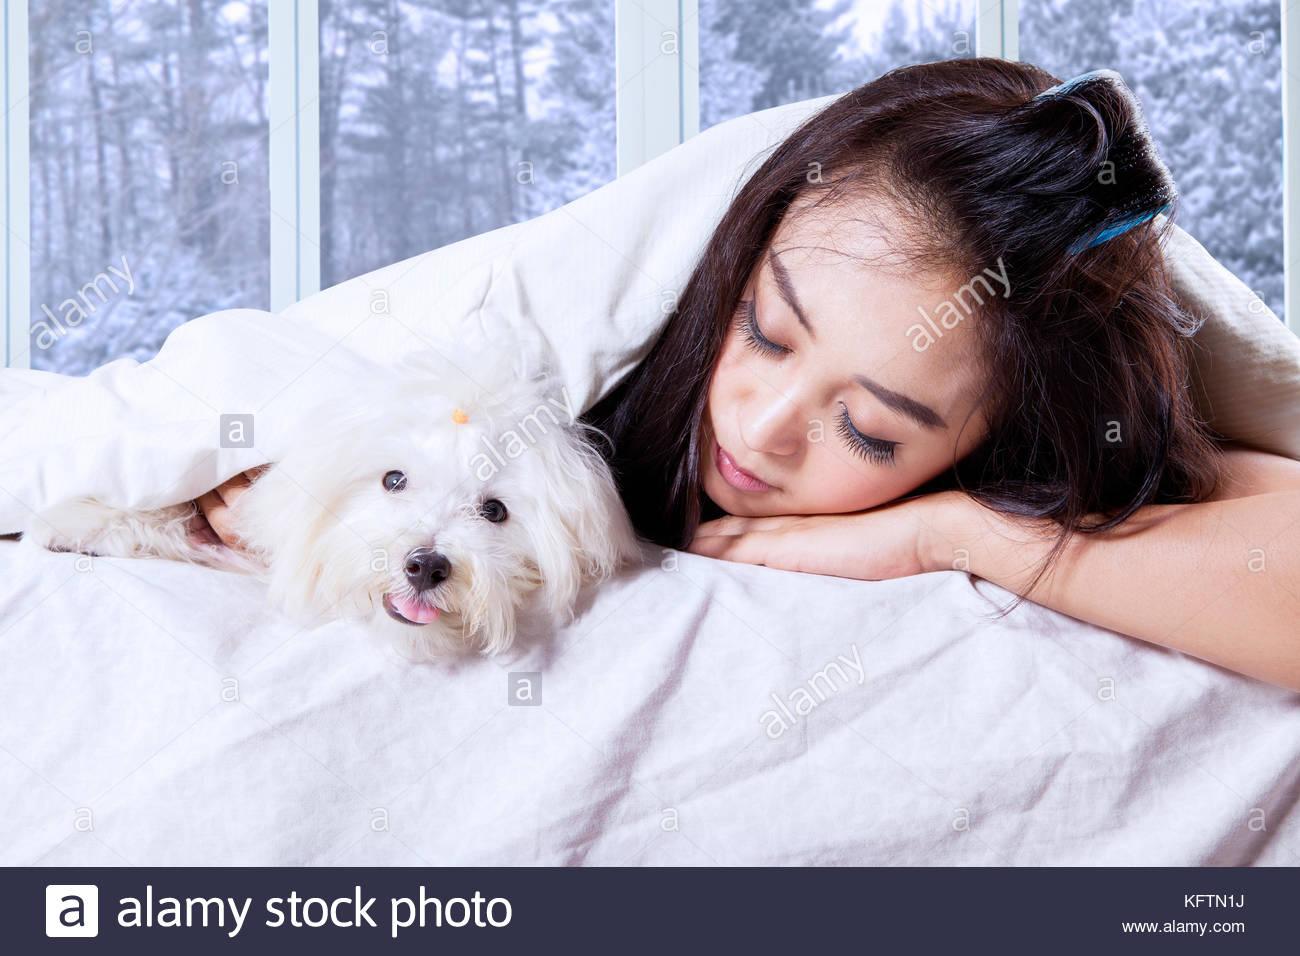 Sleeping bed winter stock photos sleeping bed winter for Sleeping with window open in winter